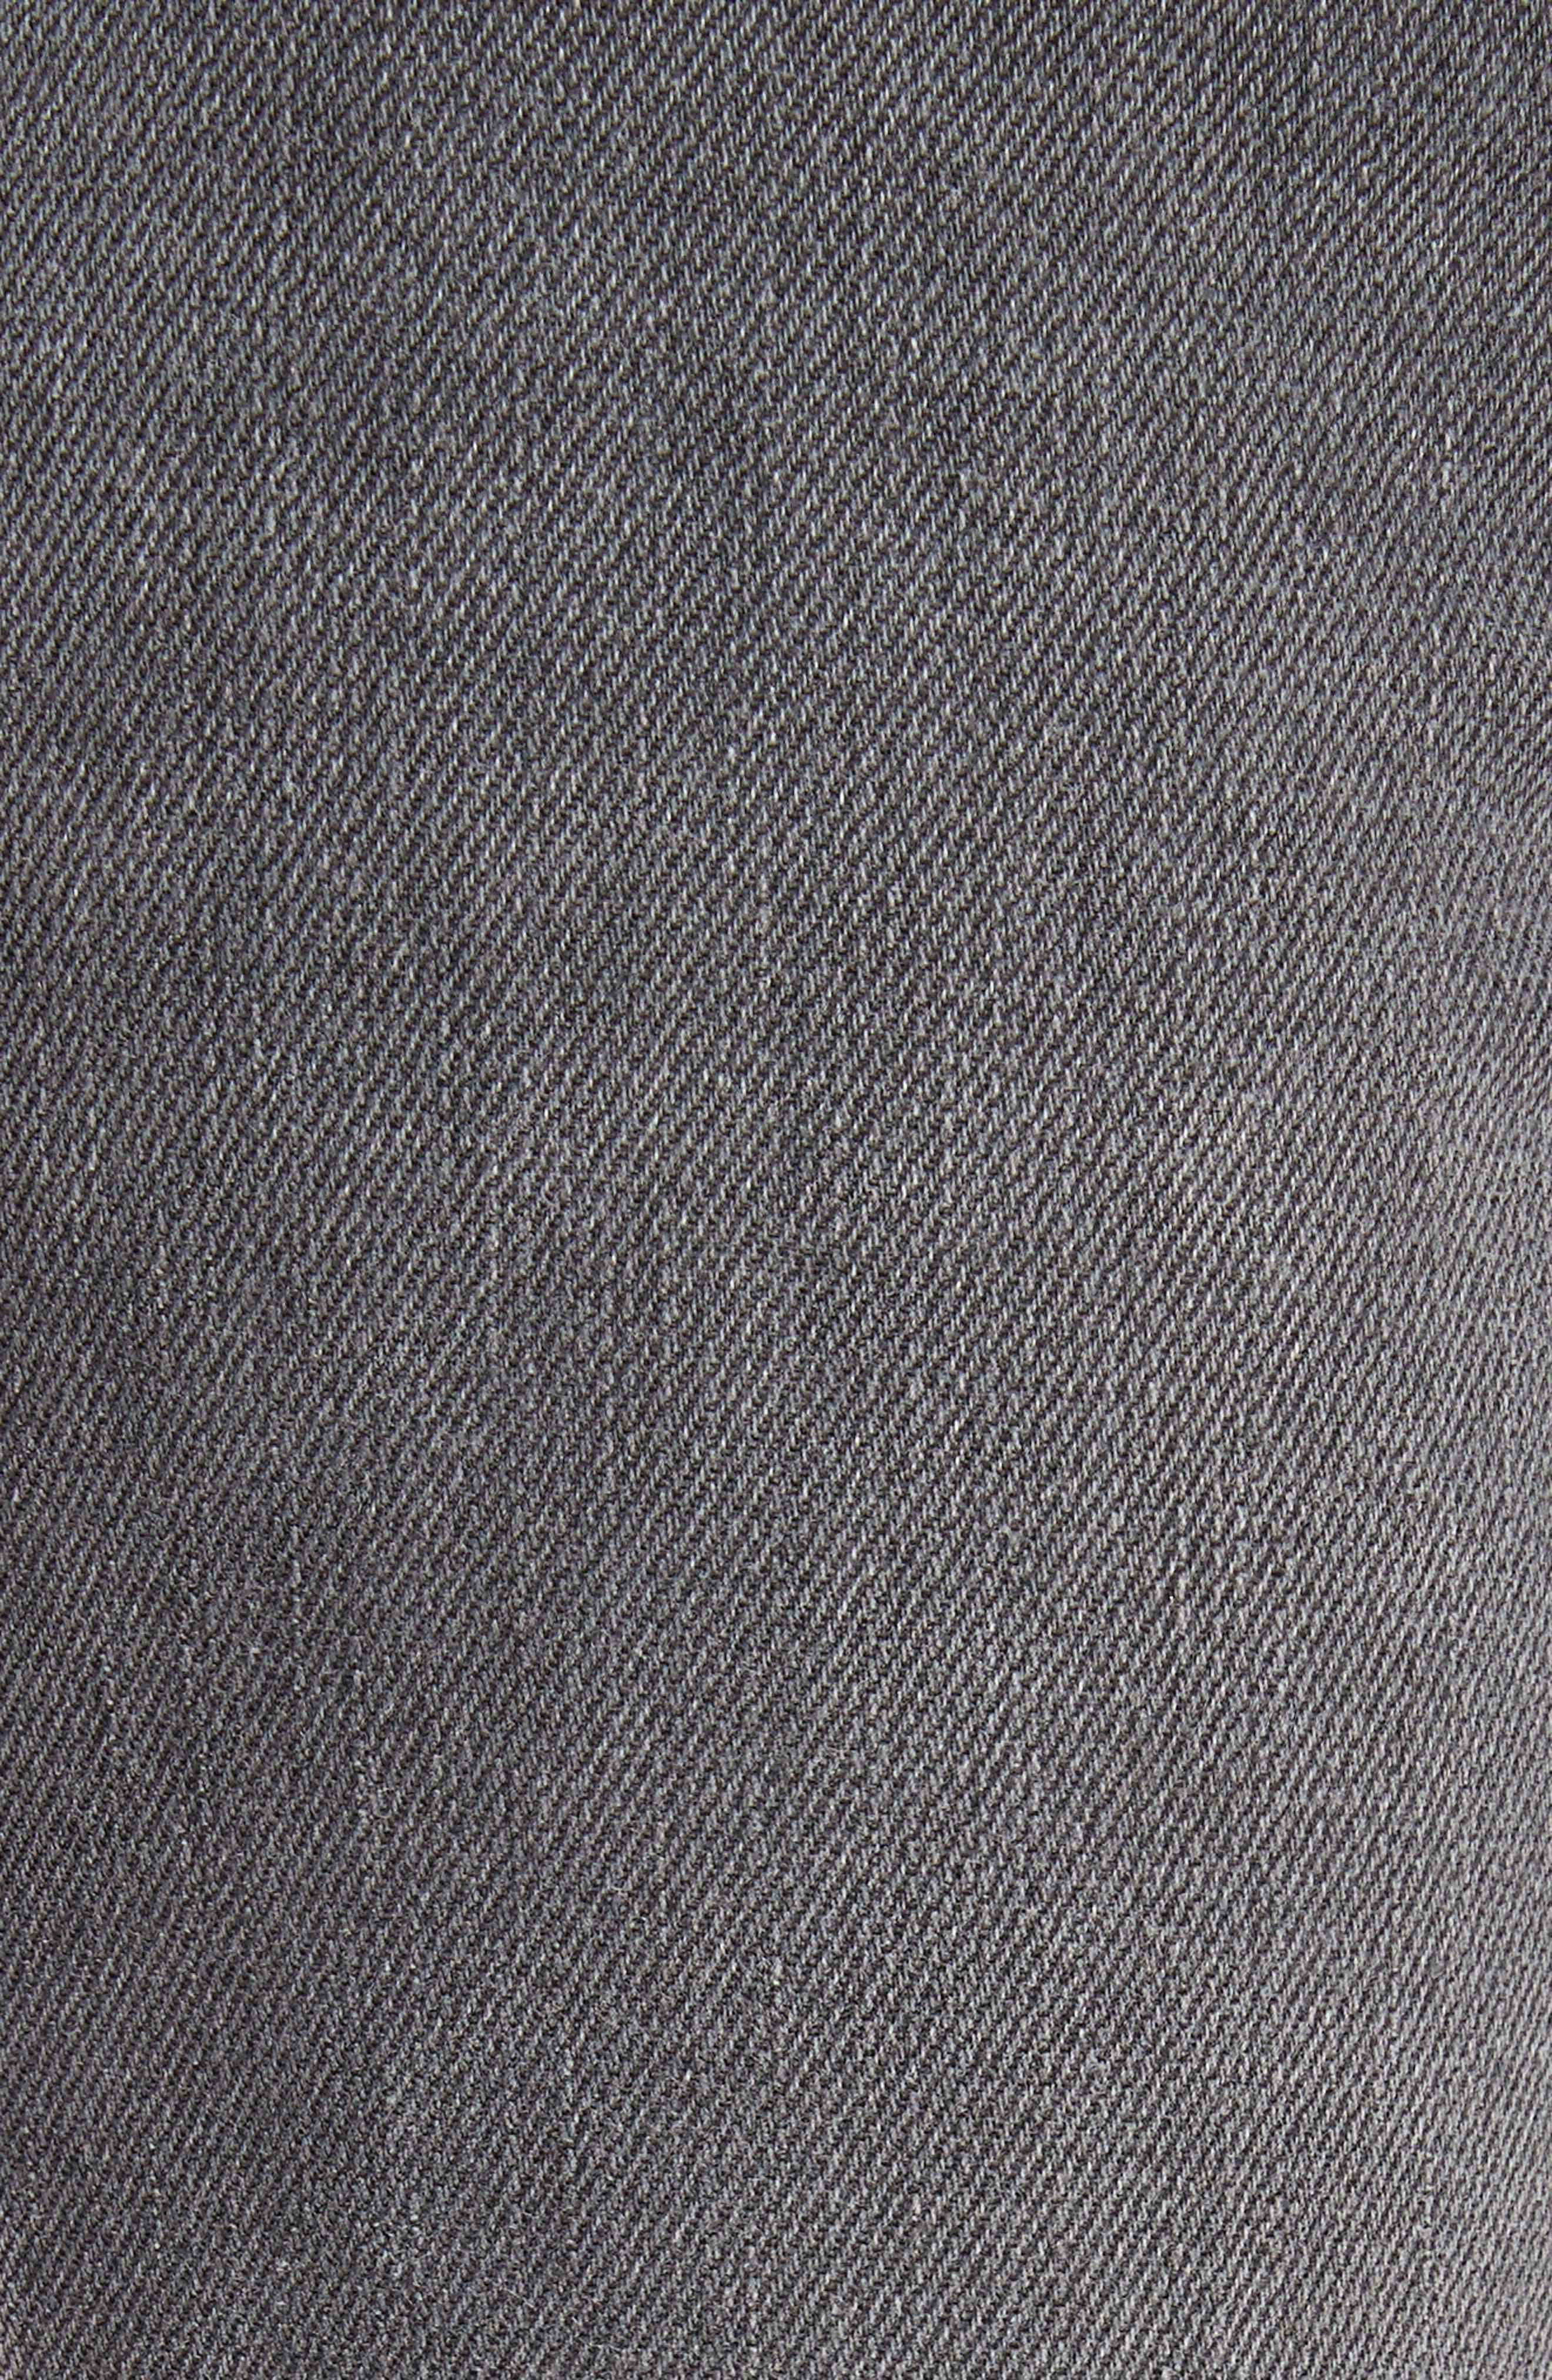 Serena High Waist Crop Flare Jeans,                             Alternate thumbnail 5, color,